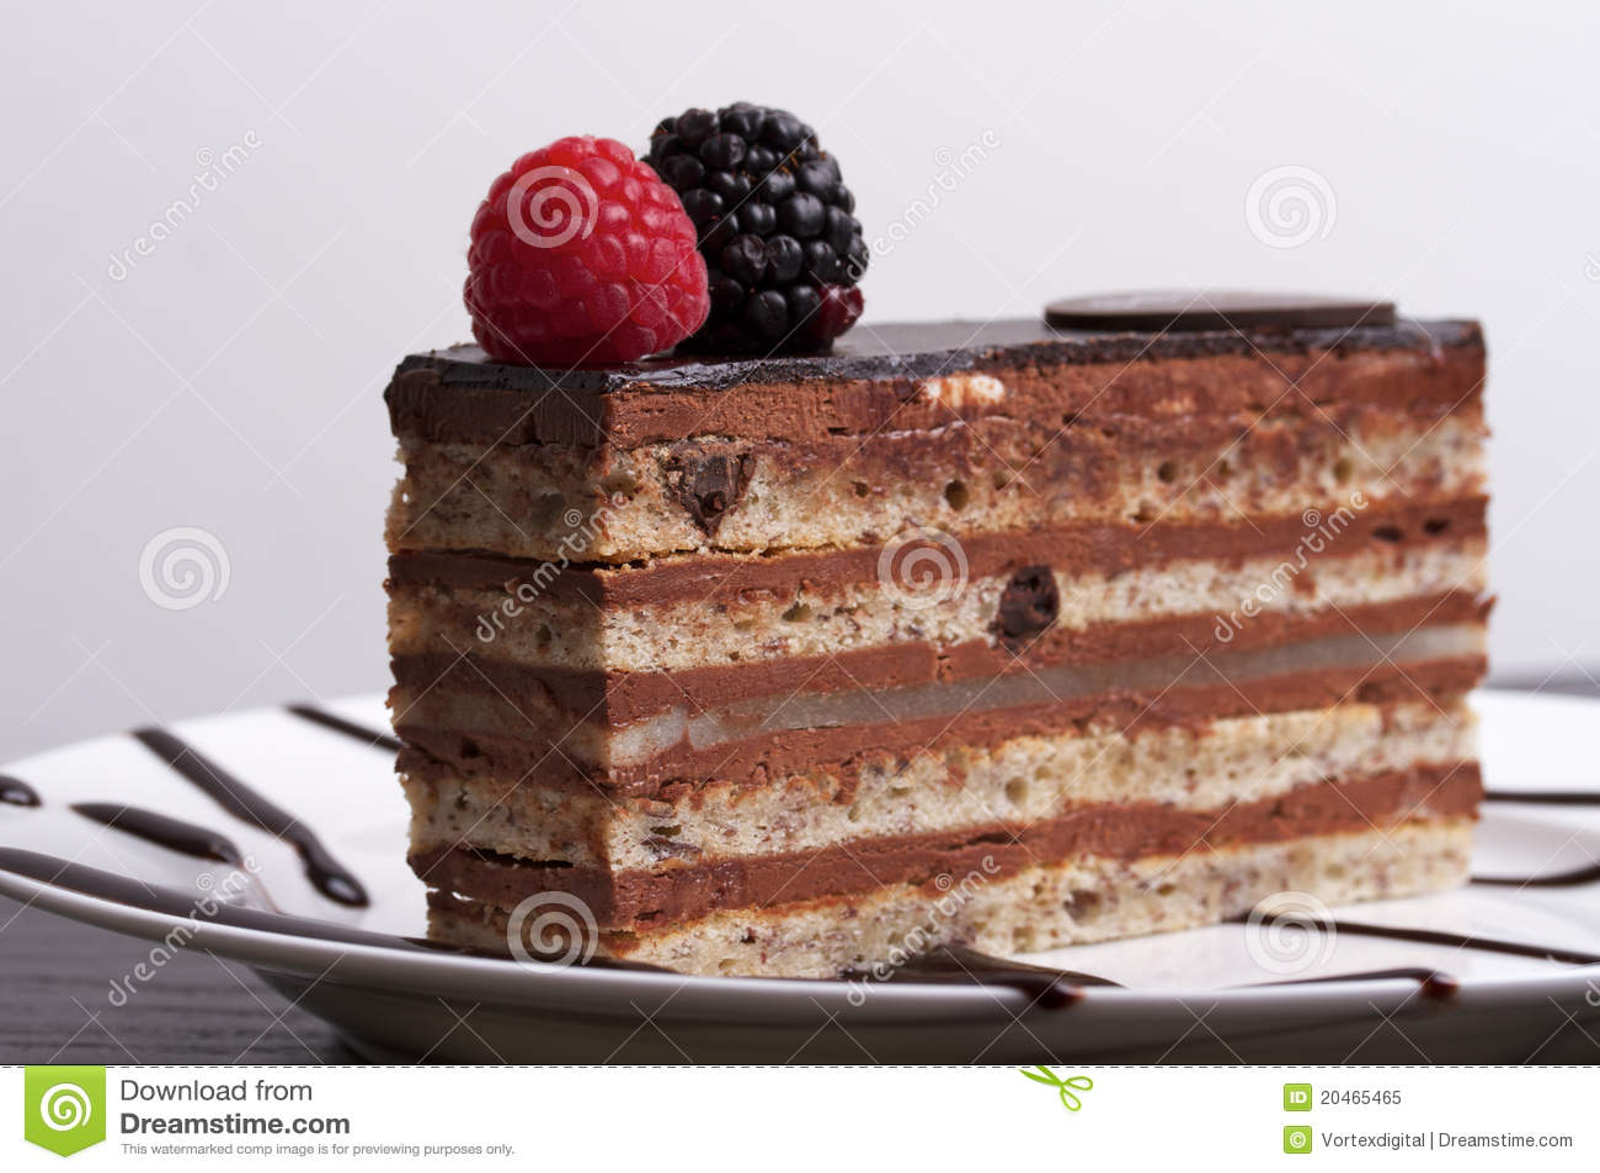 Blackberry And White Chocolate Layer Cake Recipe — Dishmaps